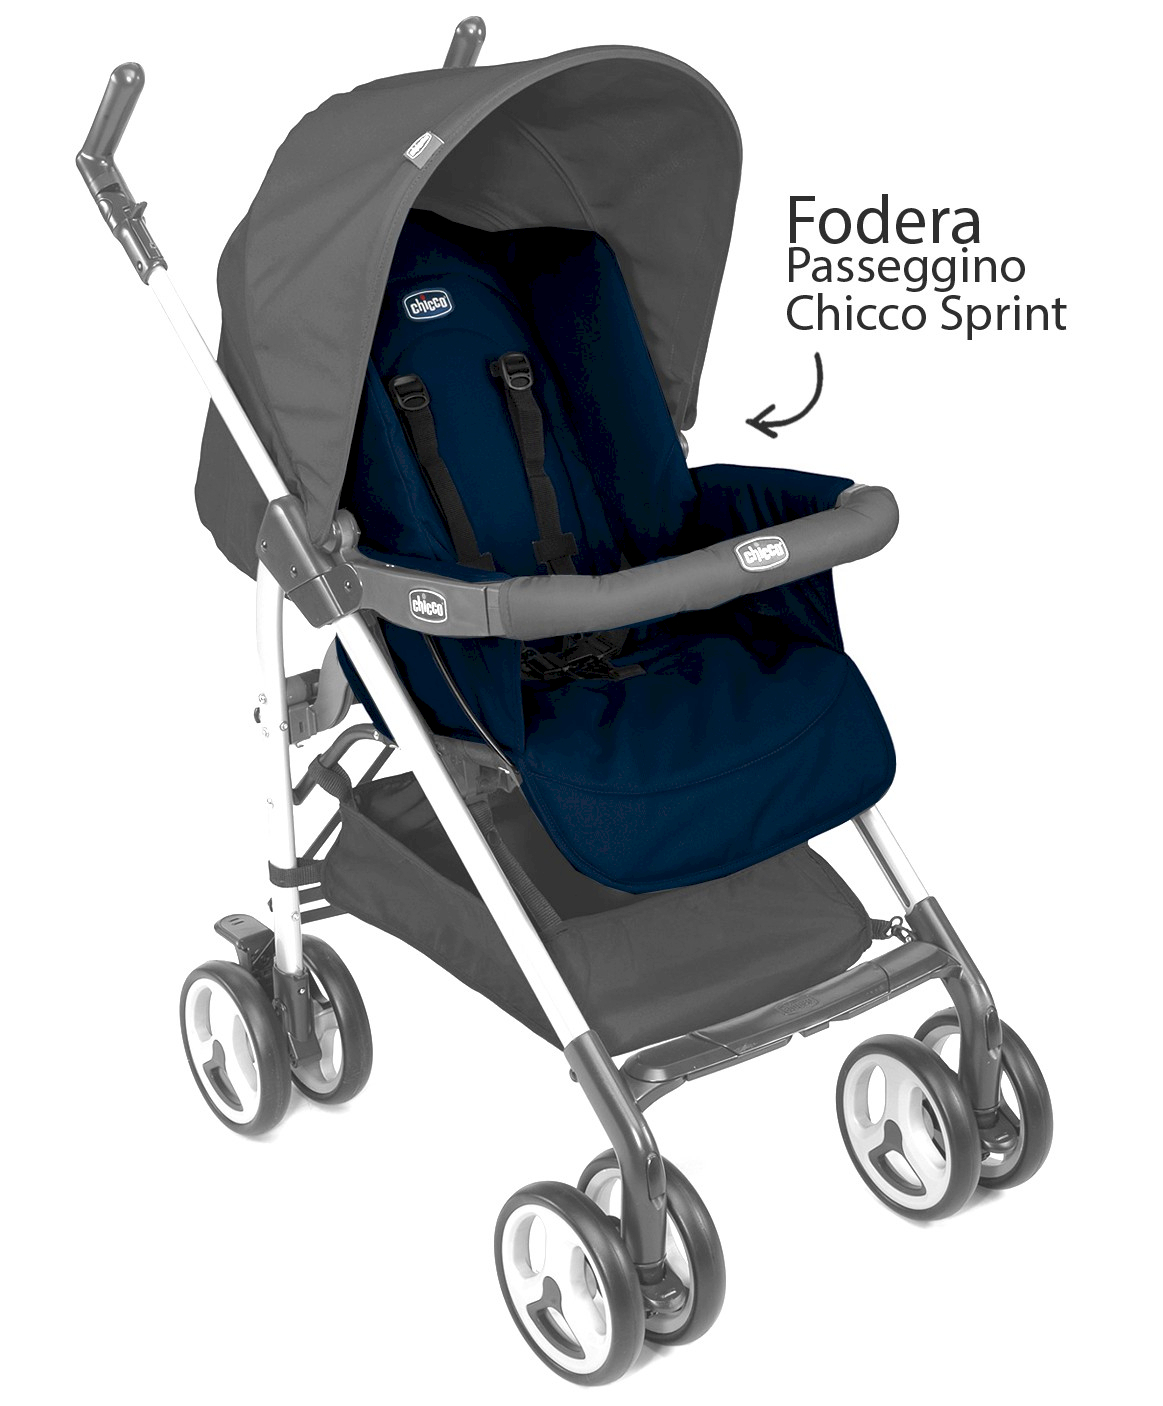 Fodera Passeggino Sprint